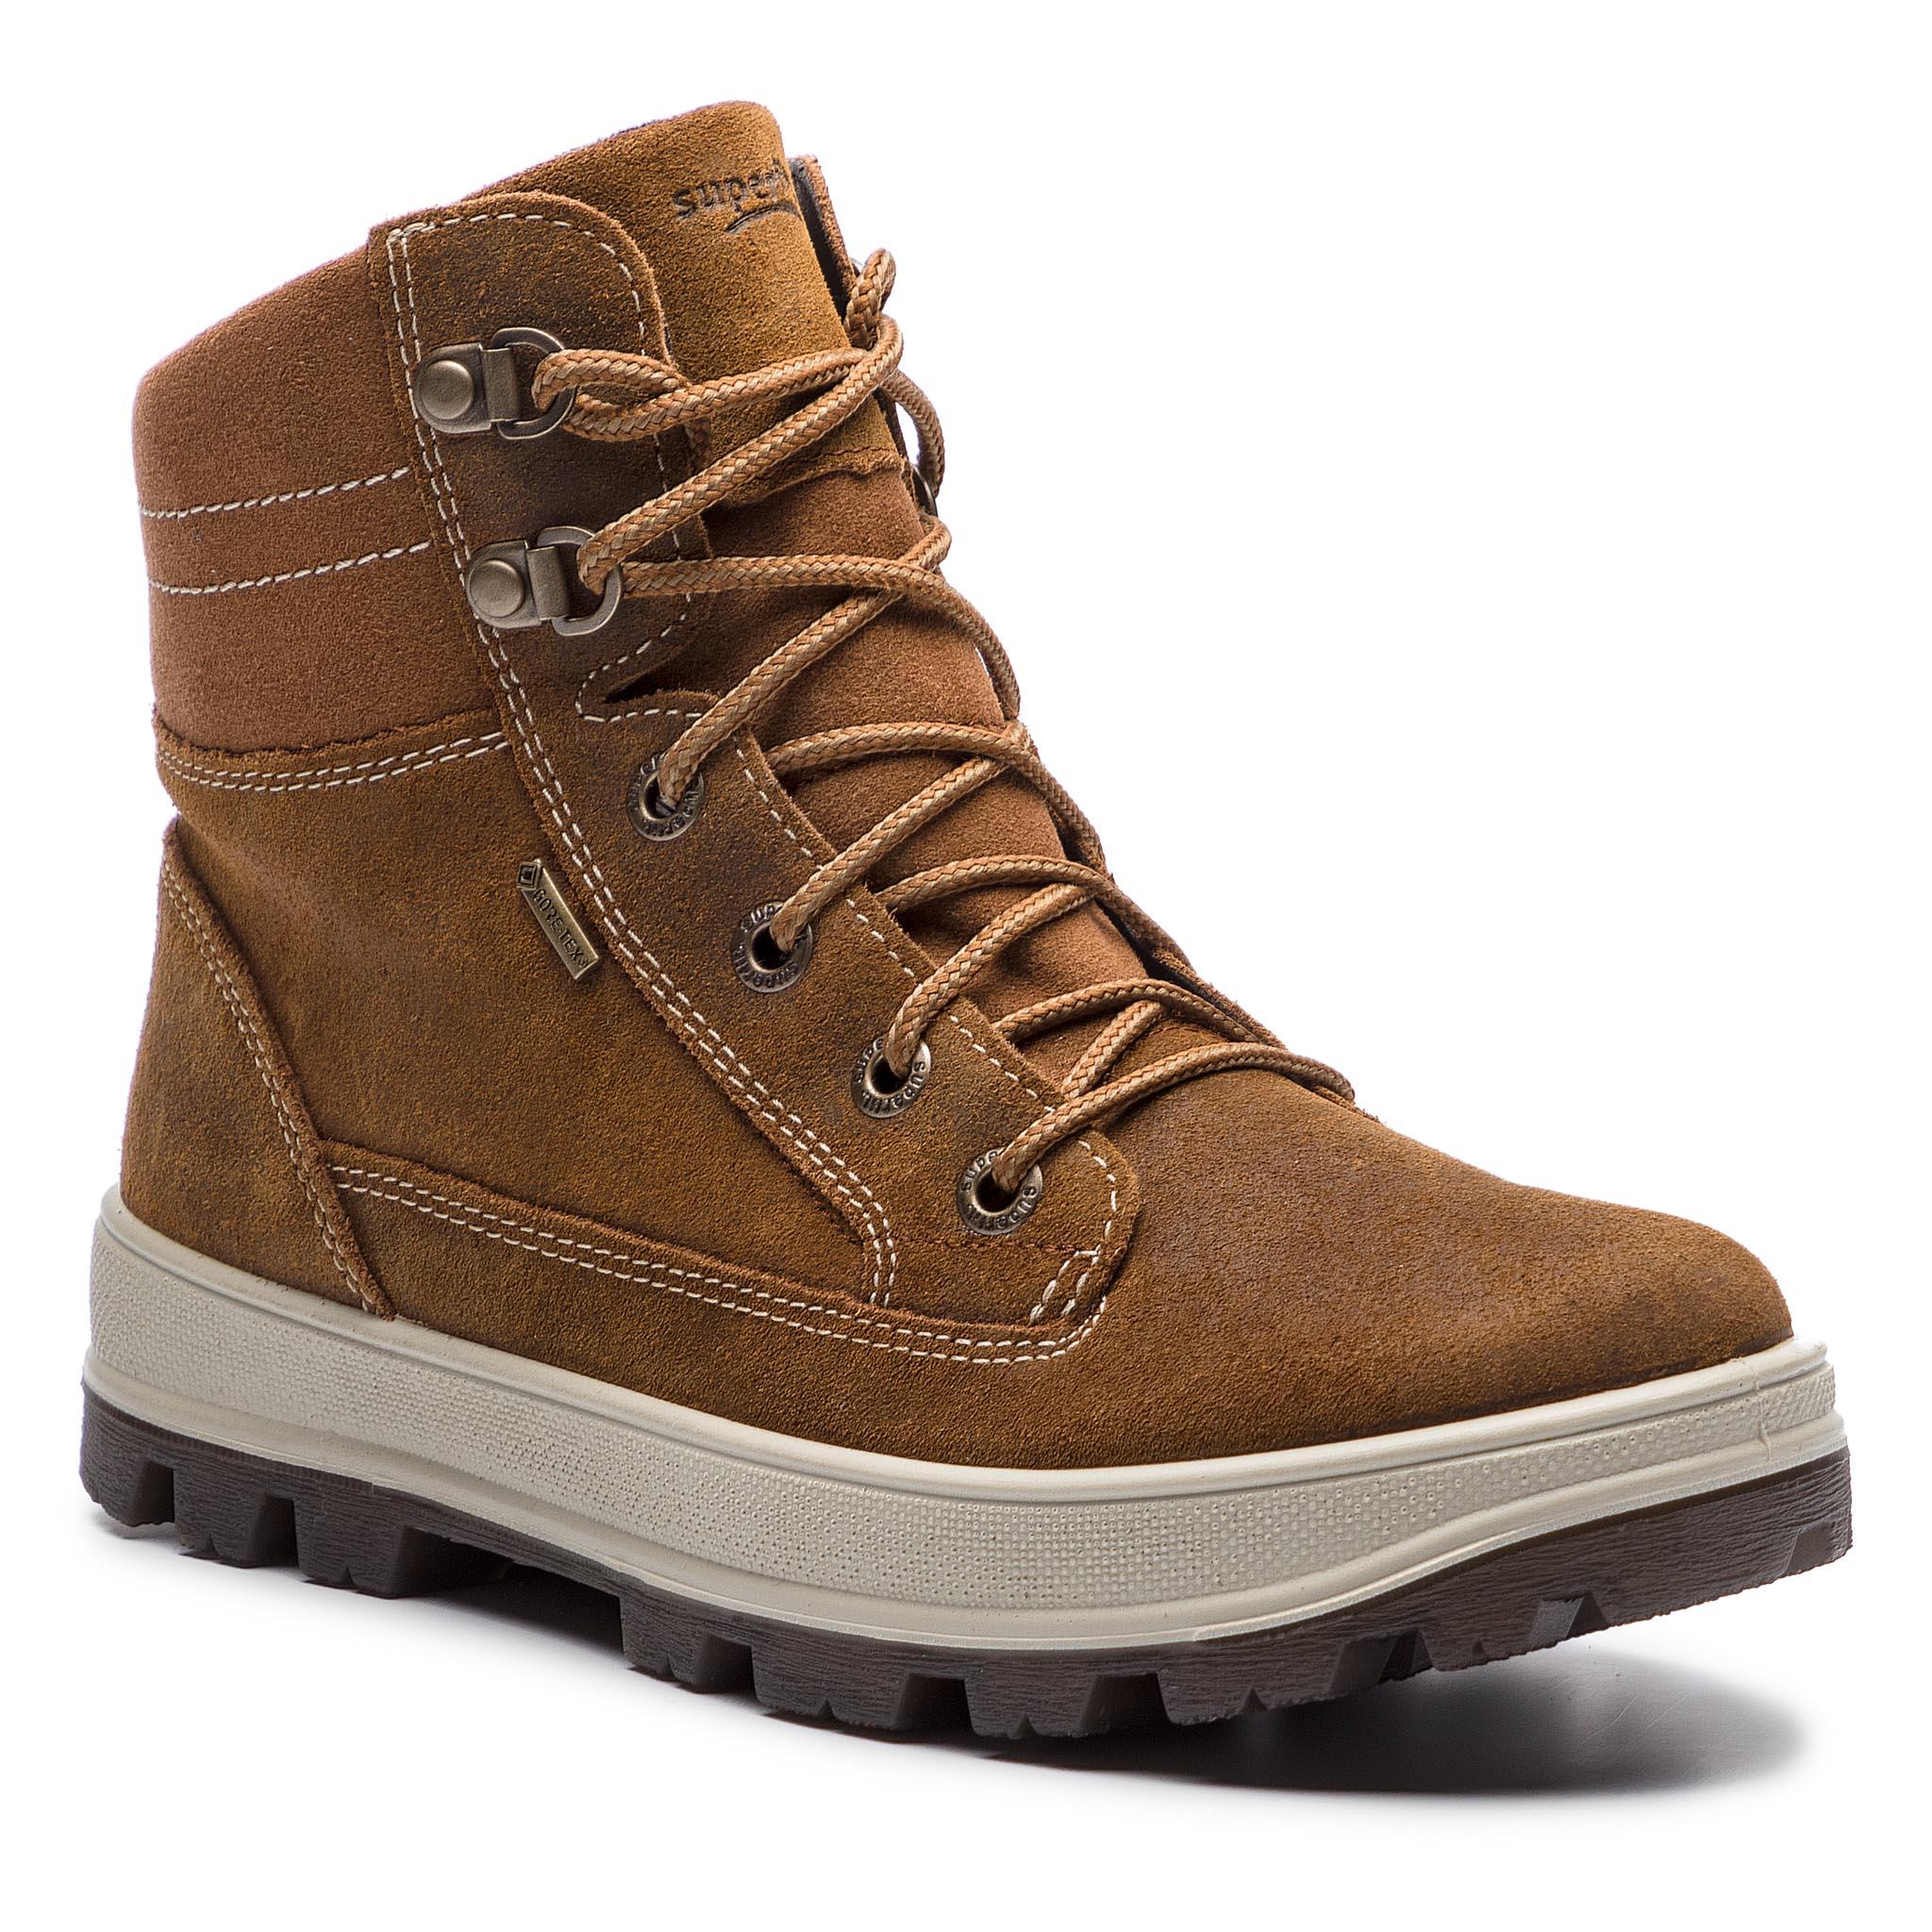 Outdoorová obuv SUPERFIT - GORE-TEX 8-00473-30 D Braun